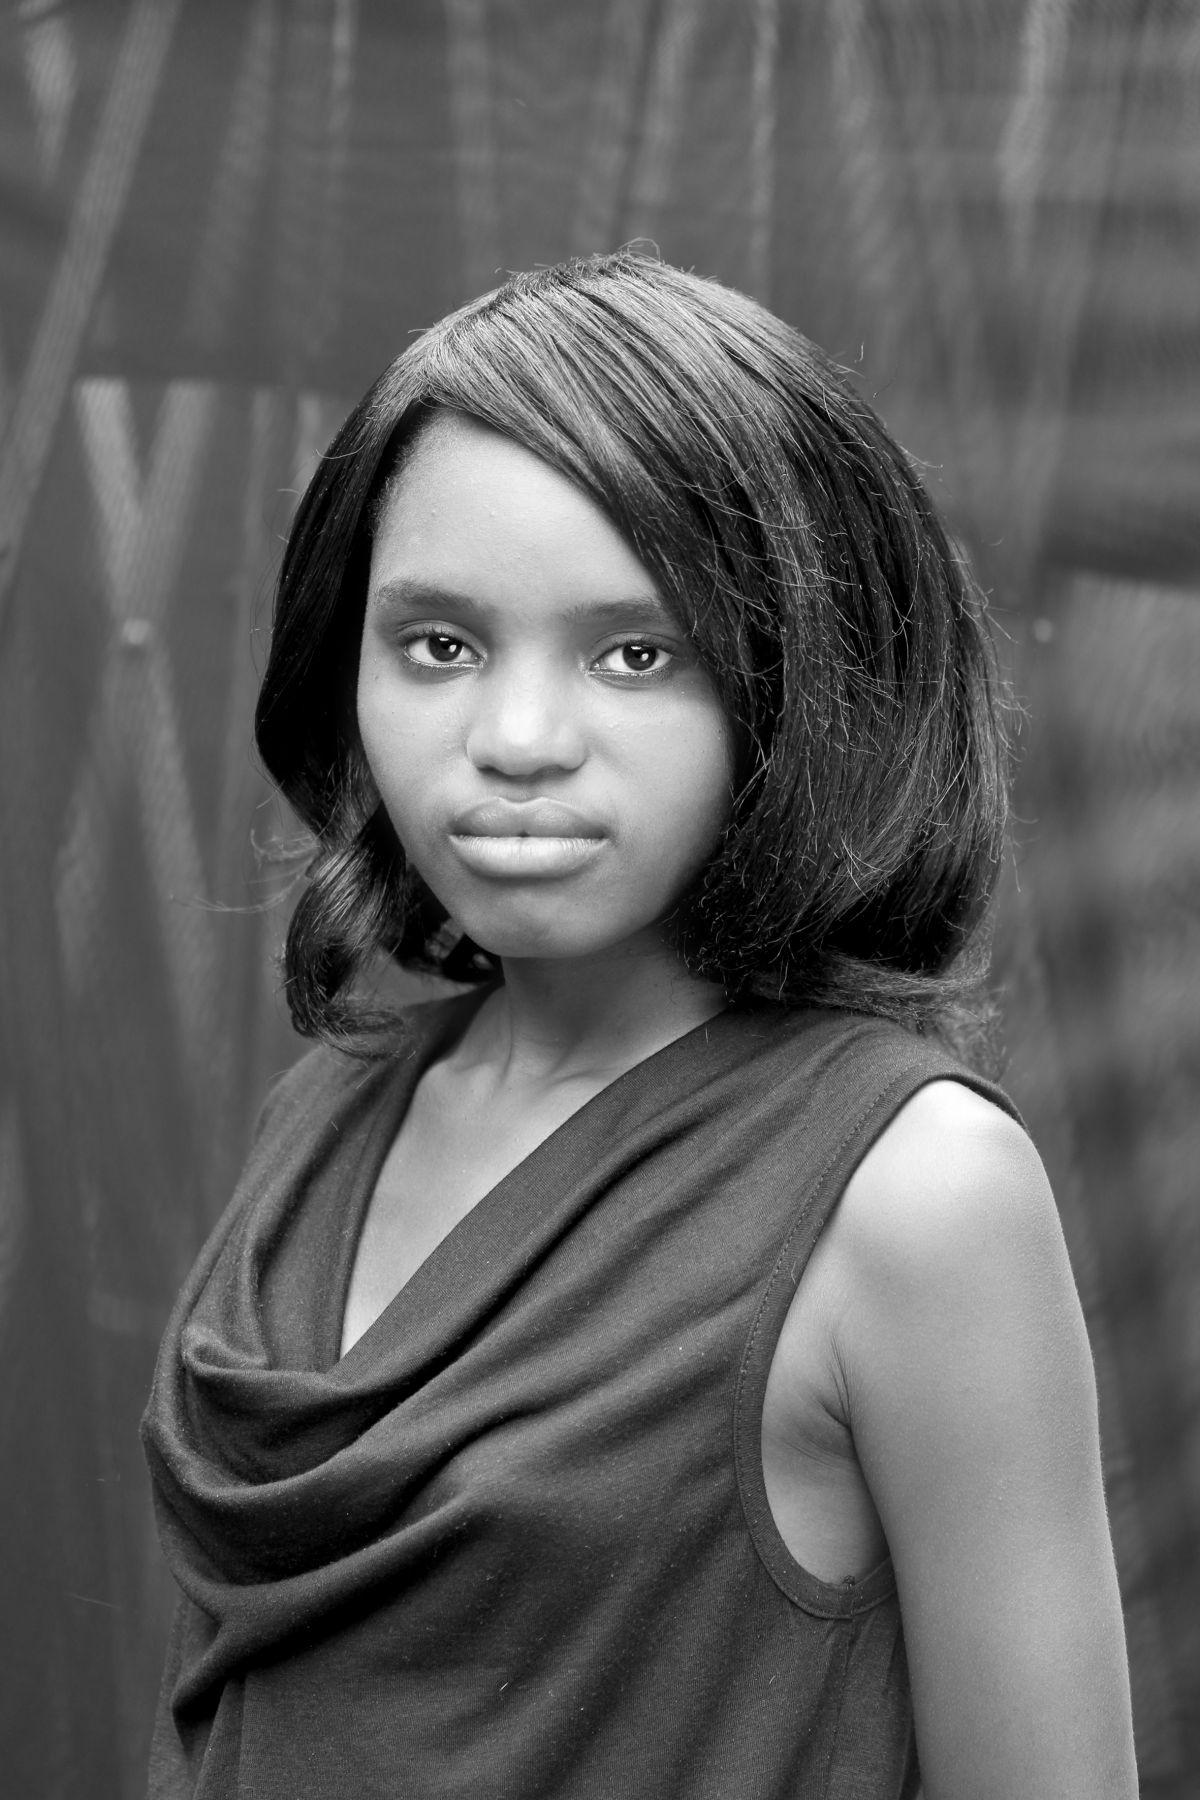 Phila Mbanjwa, Pietermaritzburg, KwaZulu Natal,2012, From the Series Faces and Phases.